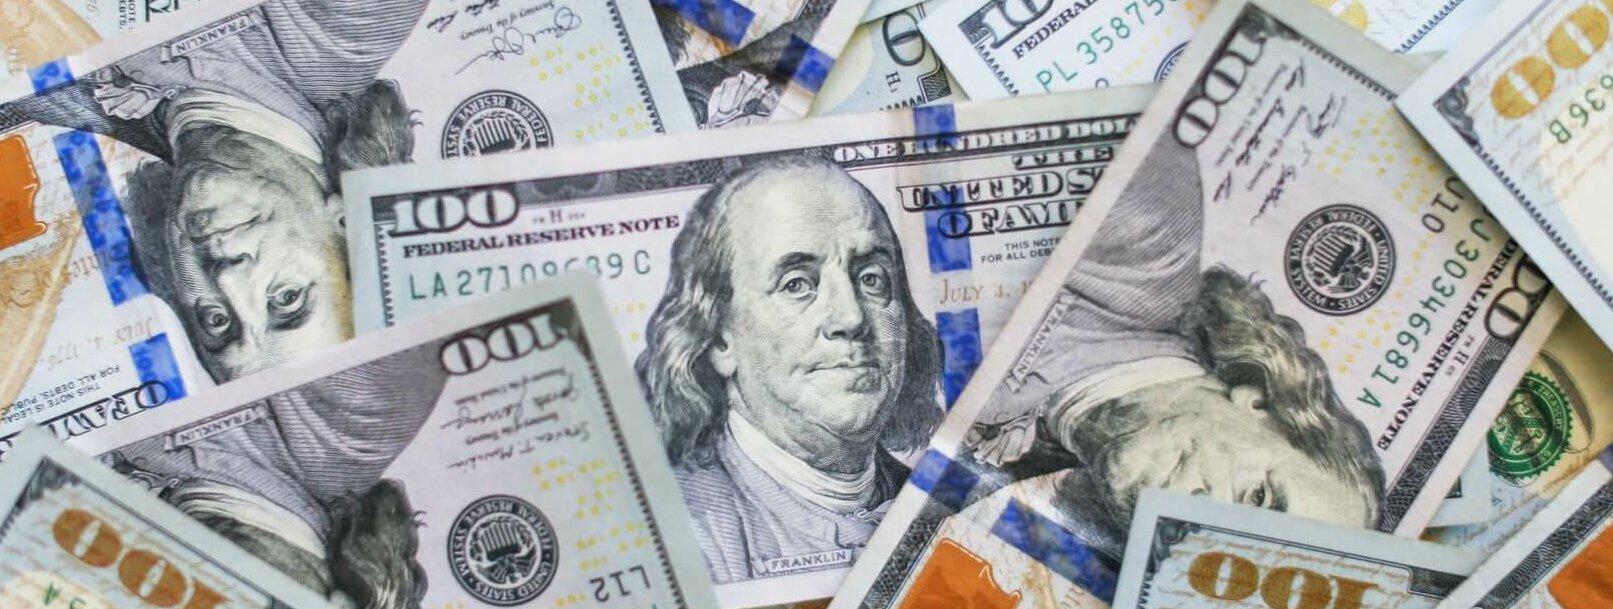 Embezzlement in North Carolina